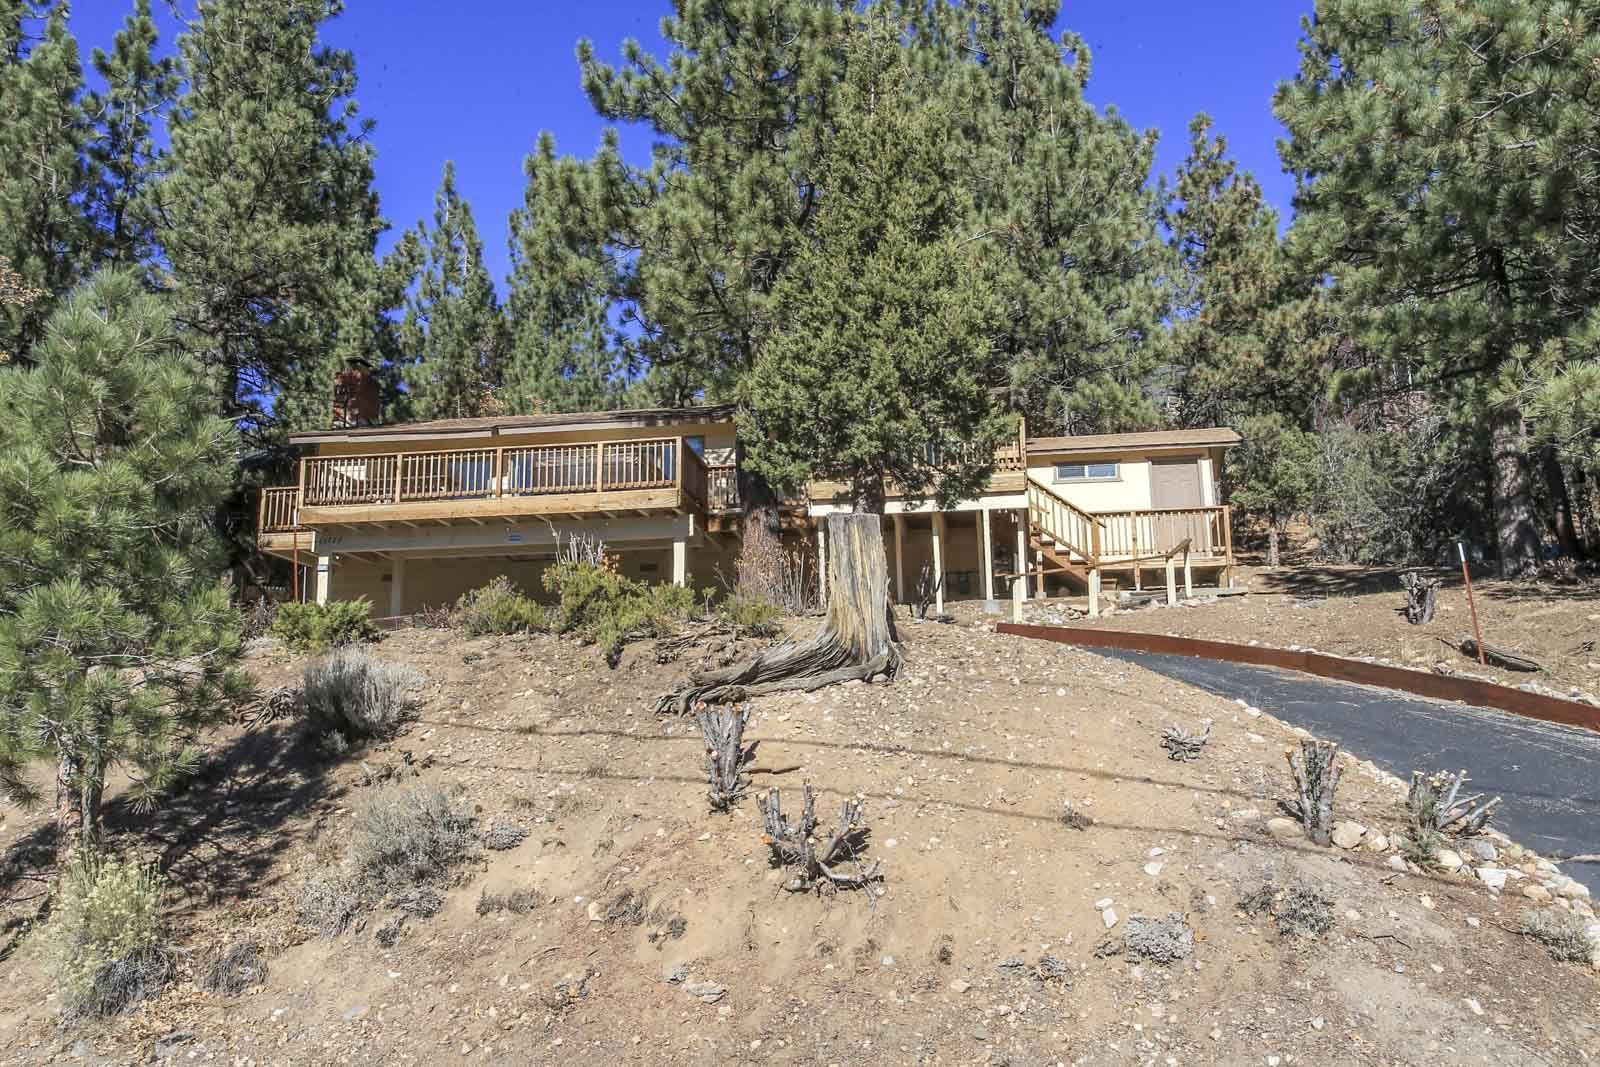 yosemite cabin for rent in big bear cabin for rent in big bear